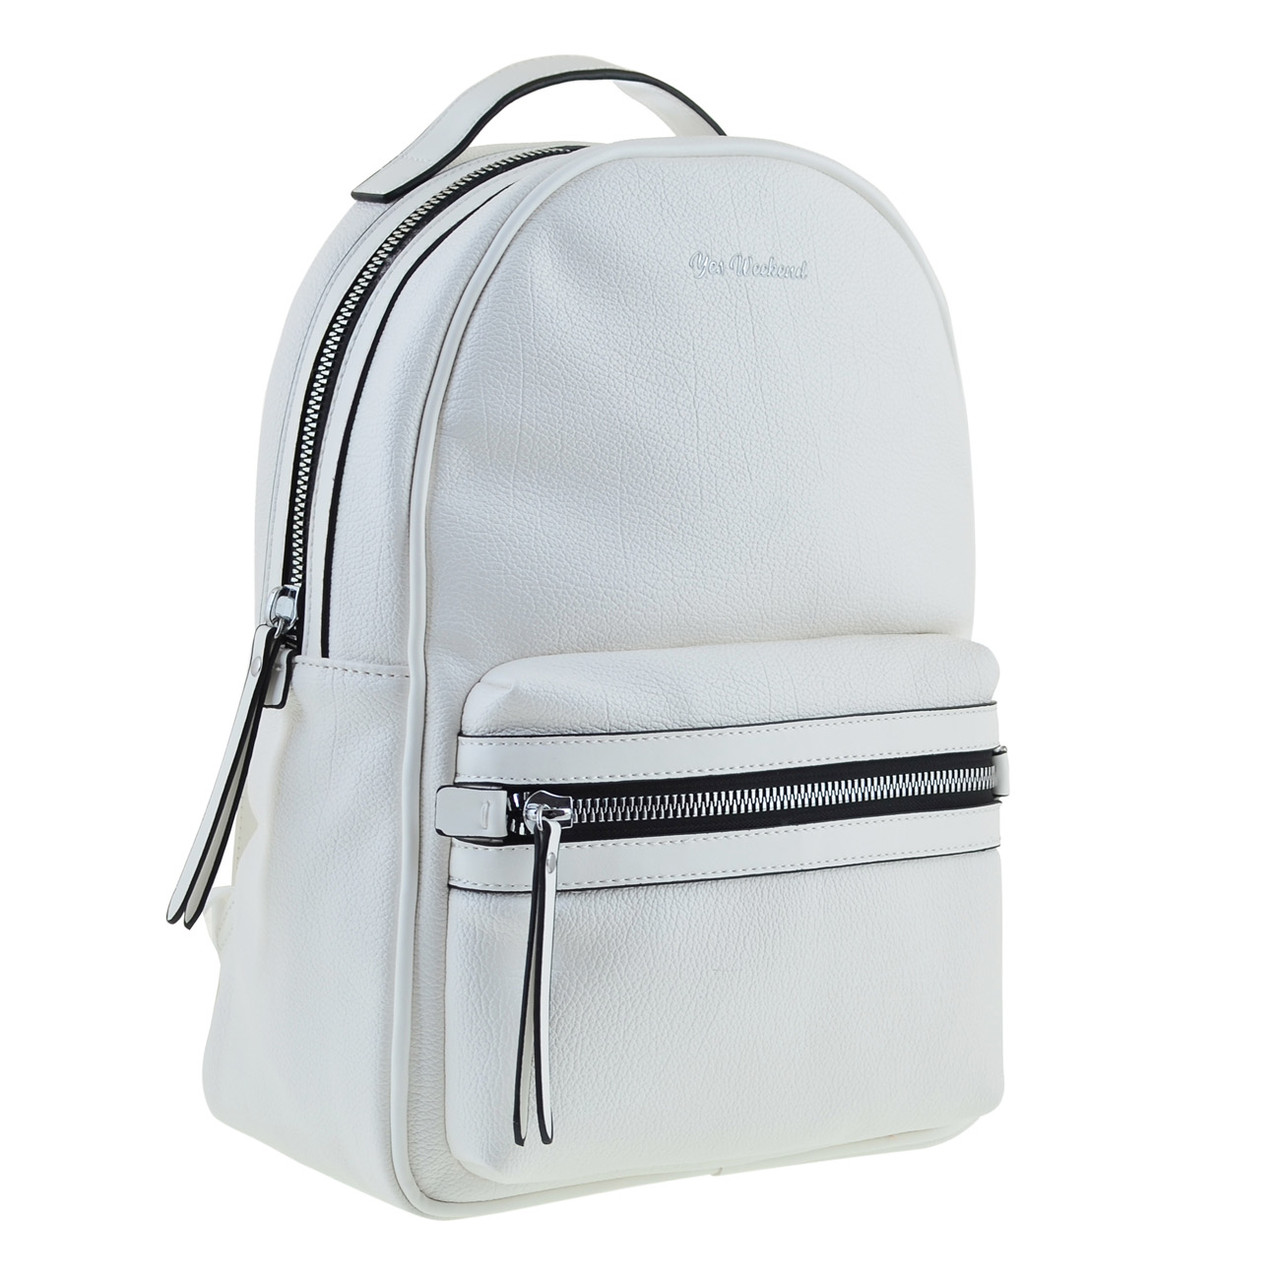 Рюкзак женский YES Weekend Florence YW44 из экокожи 37* 28*15 см белый (557801)